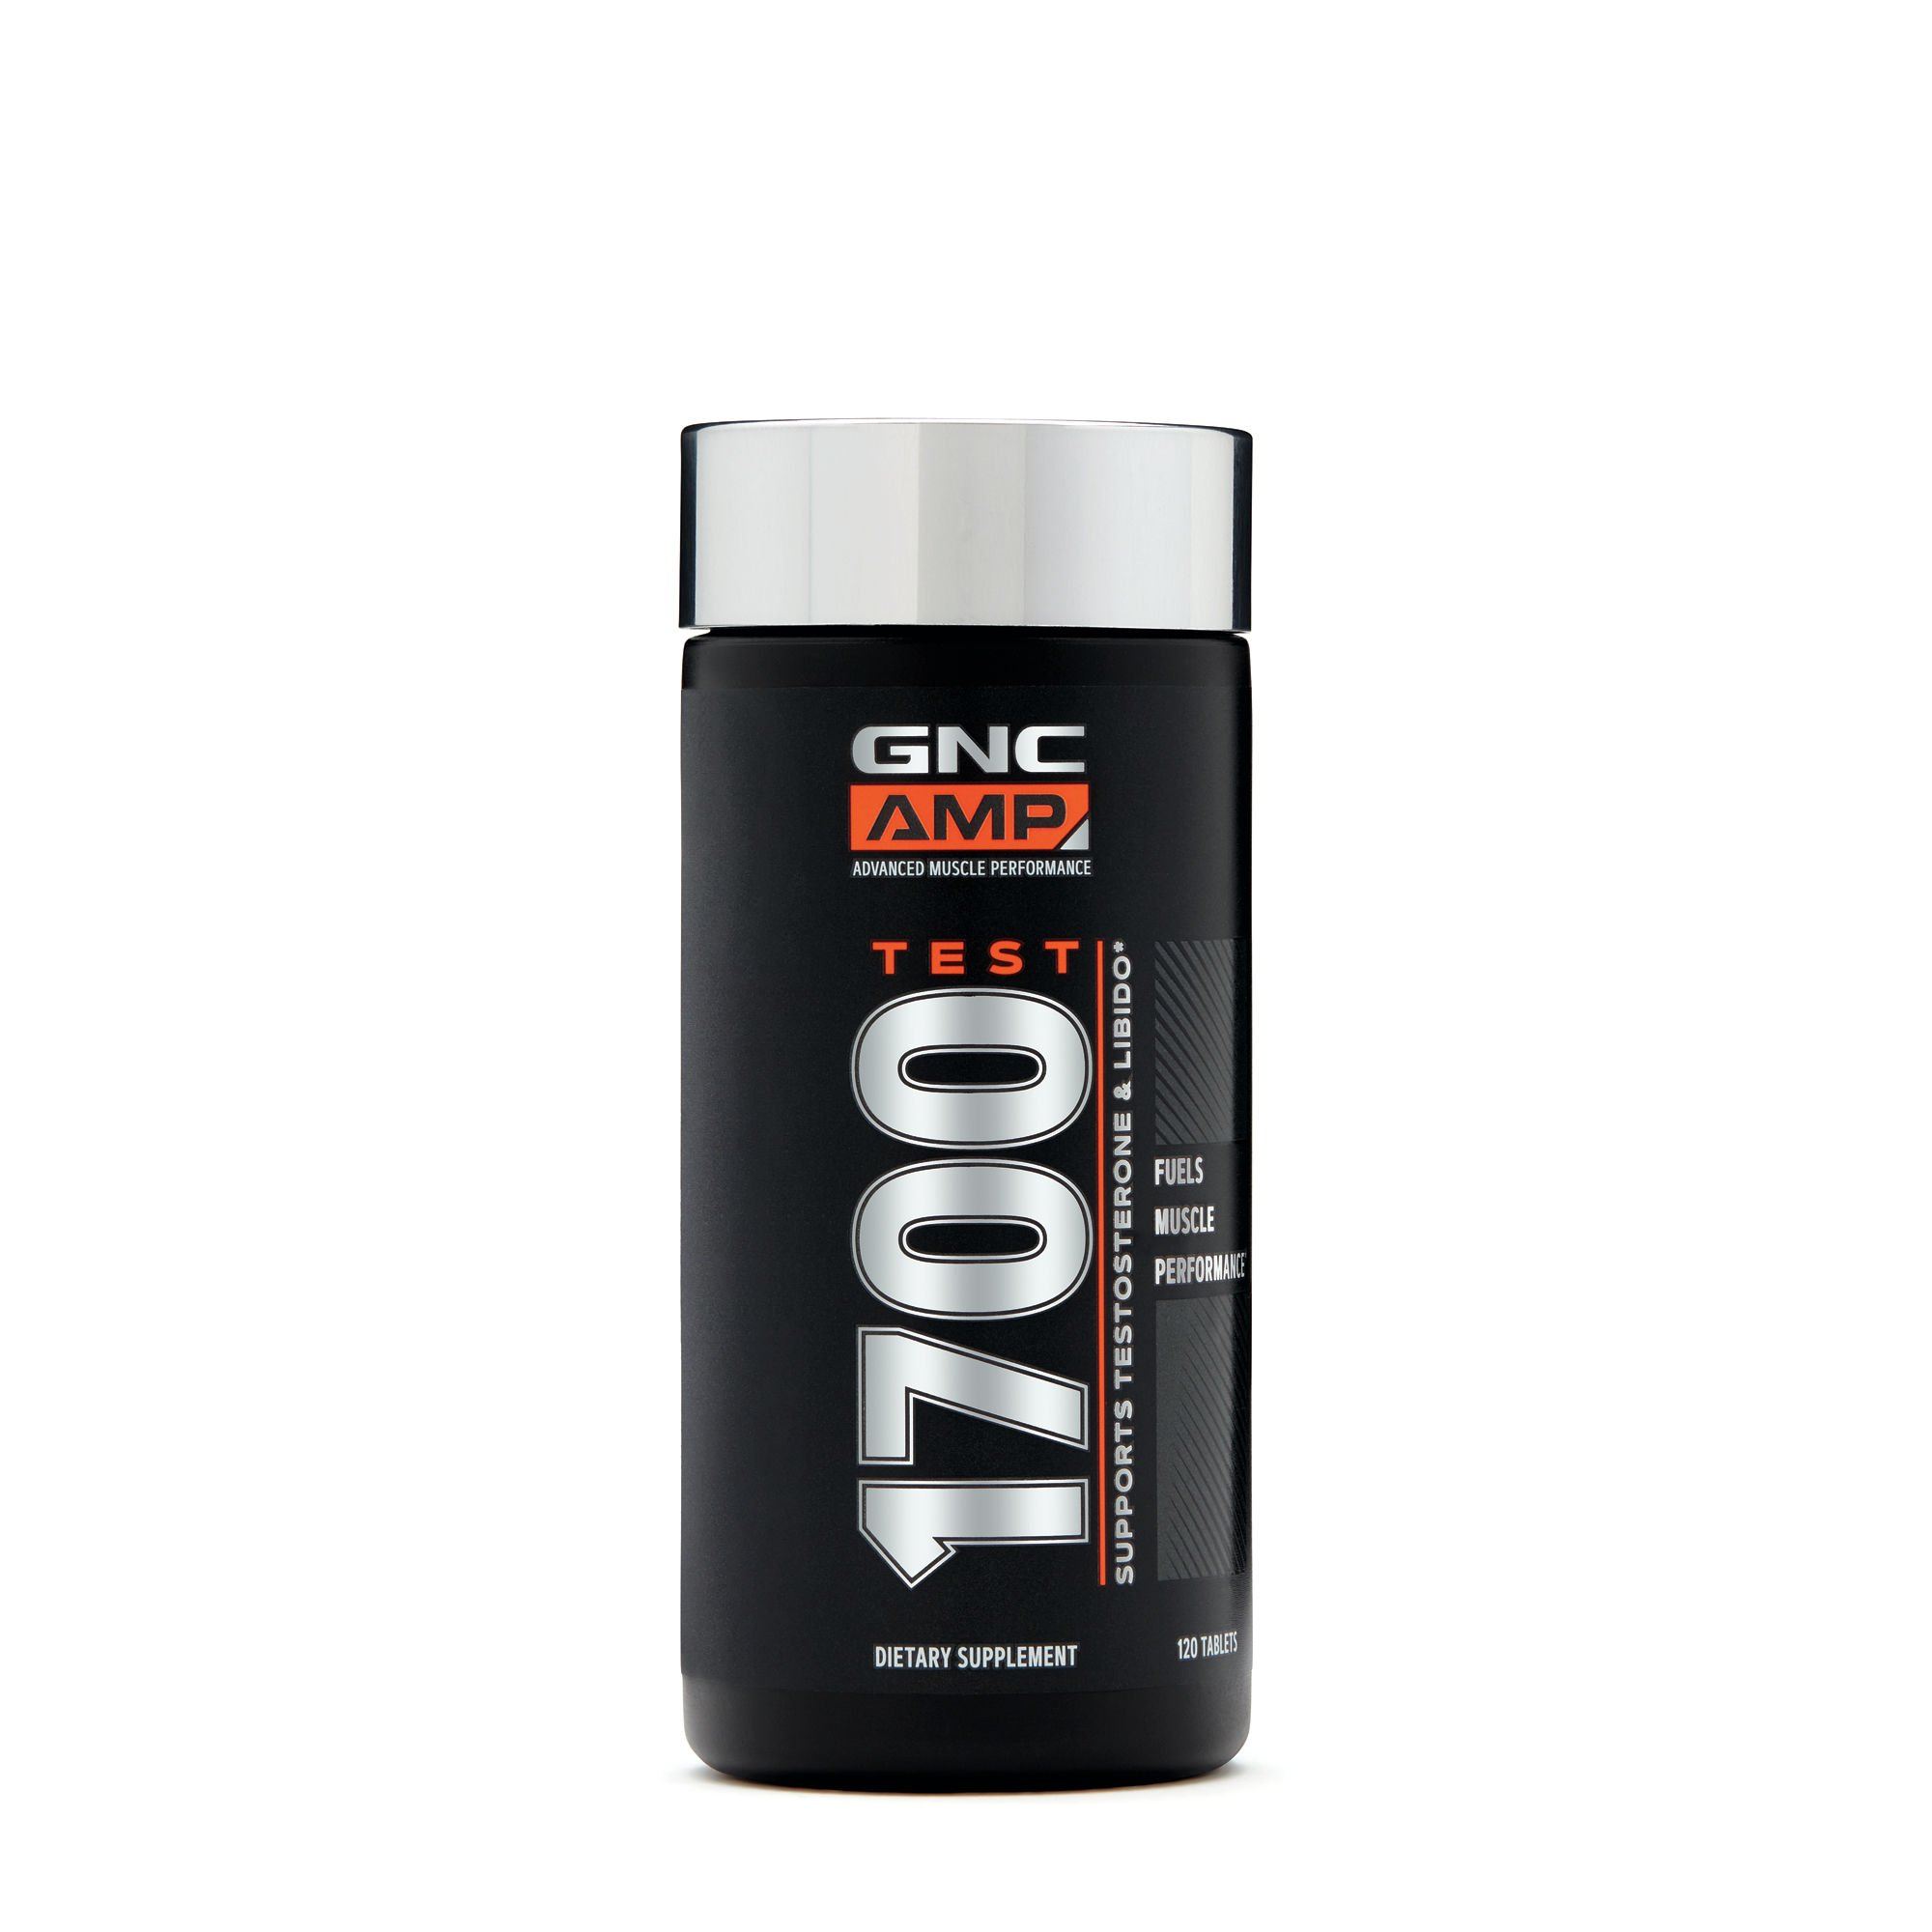 GNC AMP Test 1700